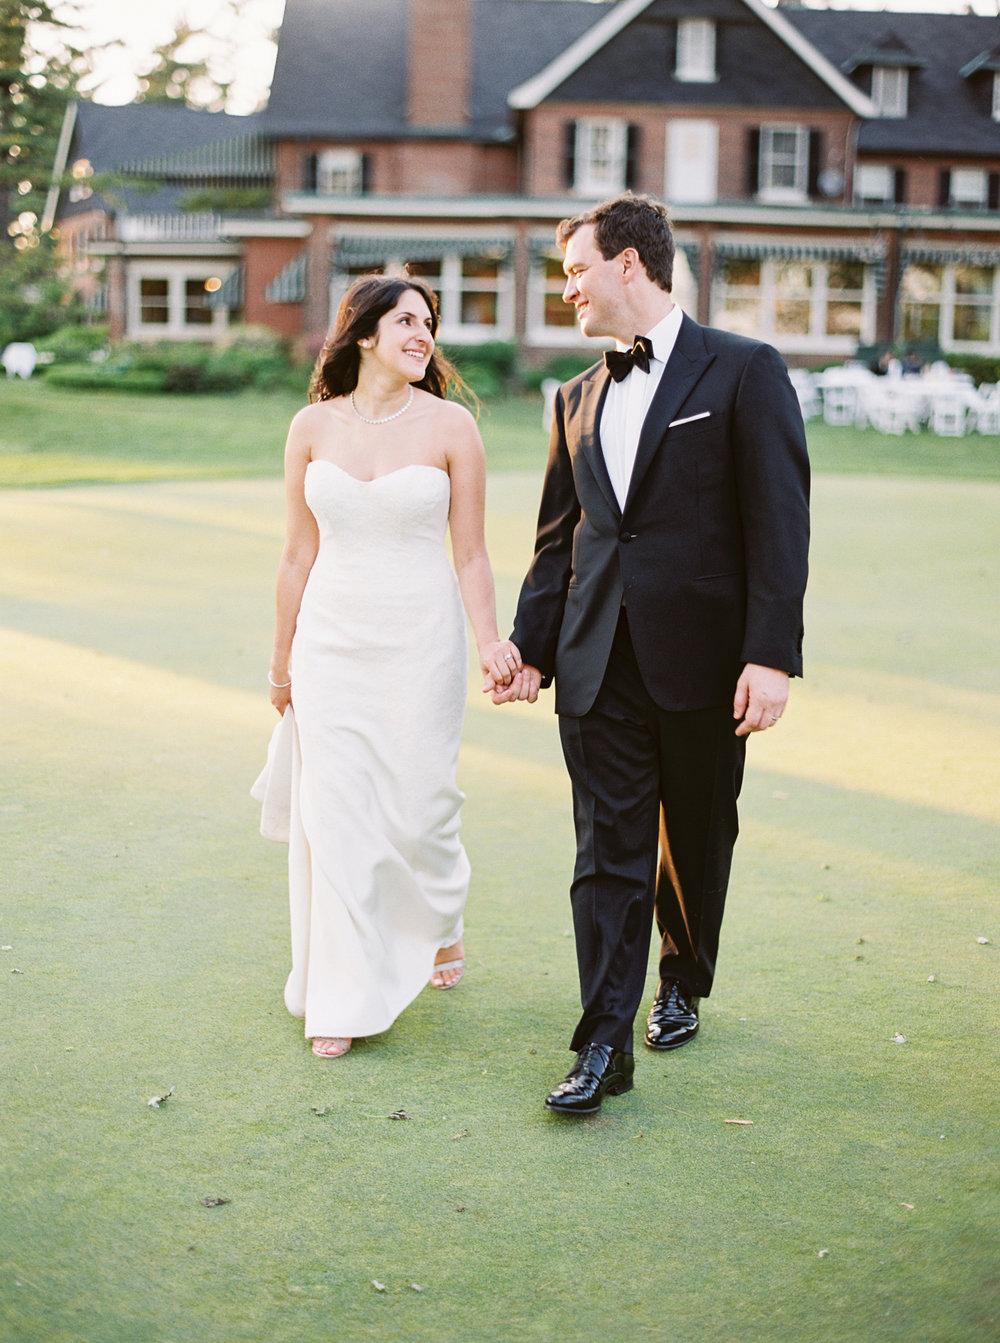 0161-Nadia-Chris-Married-When He Founf Her-Toronto Golf Club.jpg